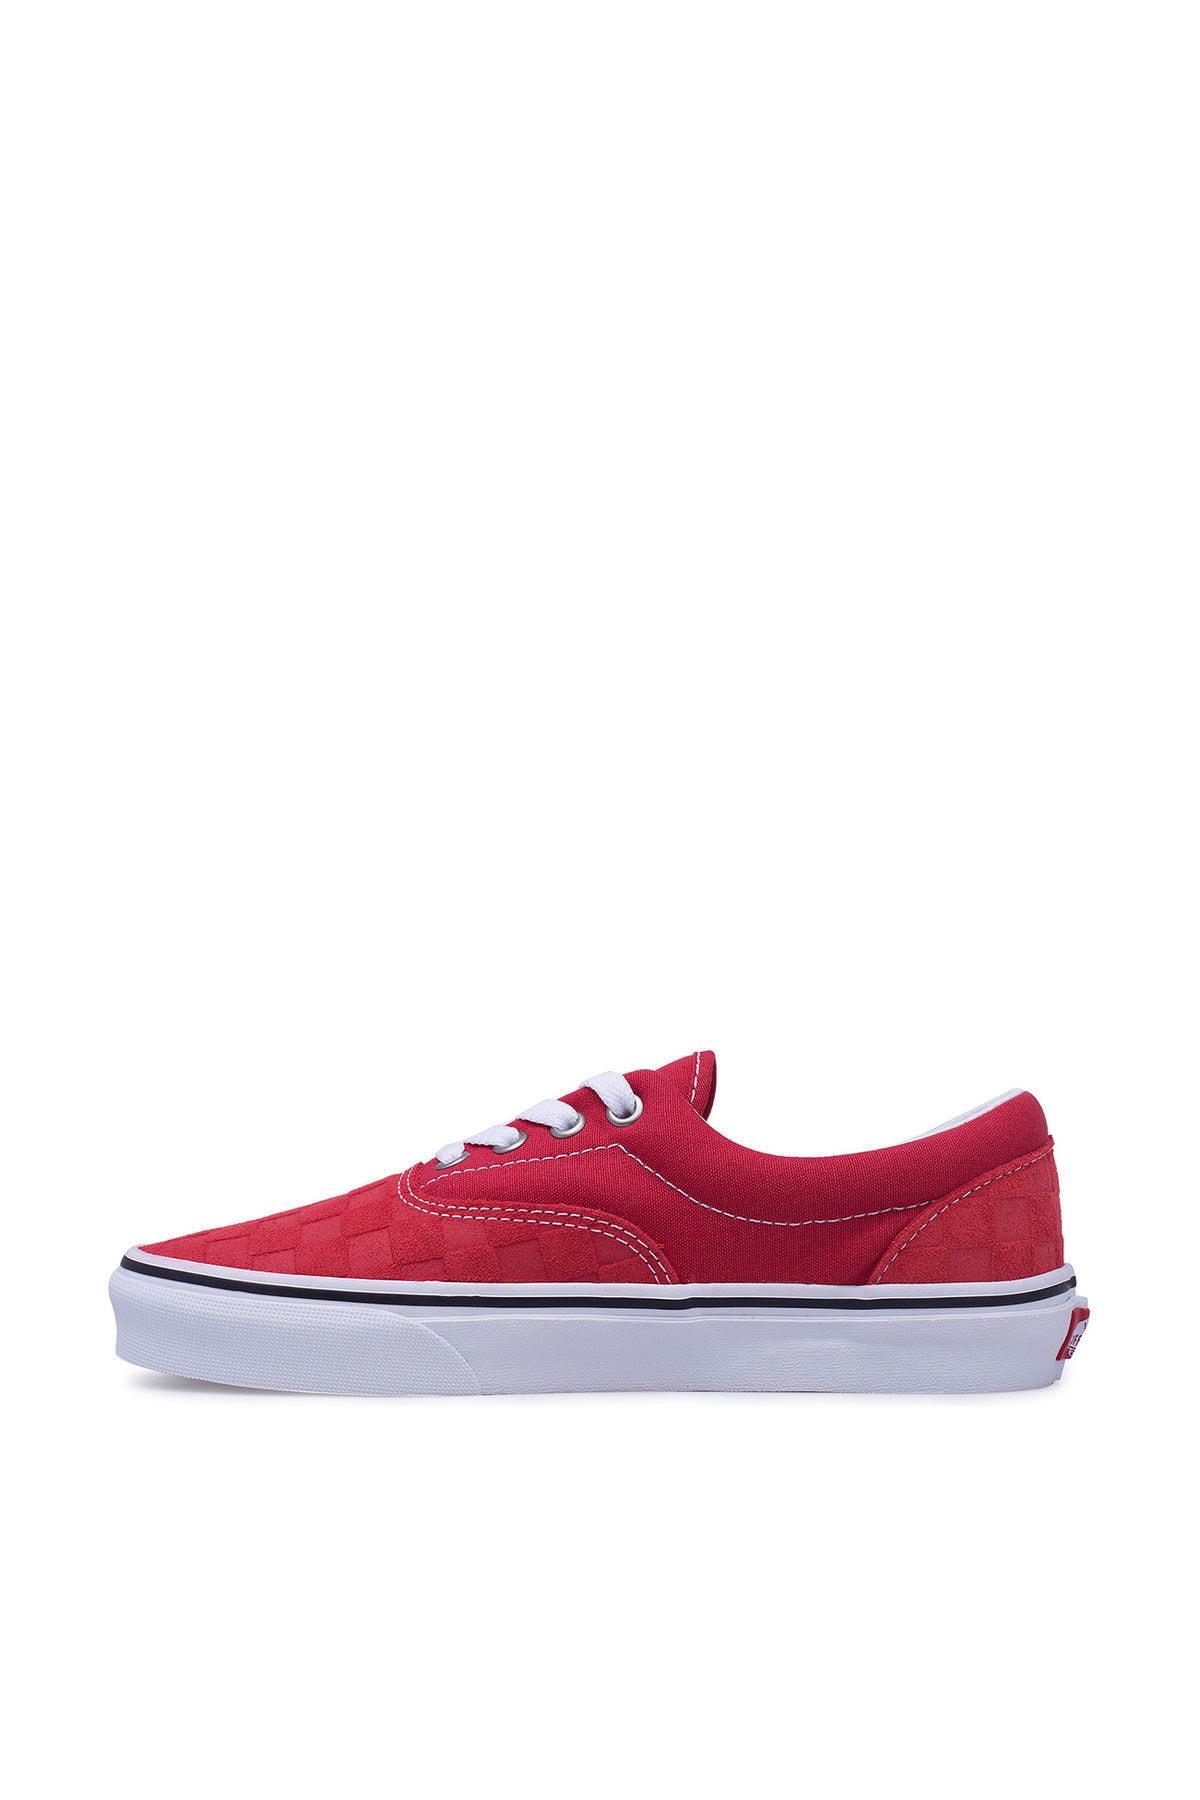 Vans Kırmızı Unisex Sneaker VN0A4U39WJ21 2